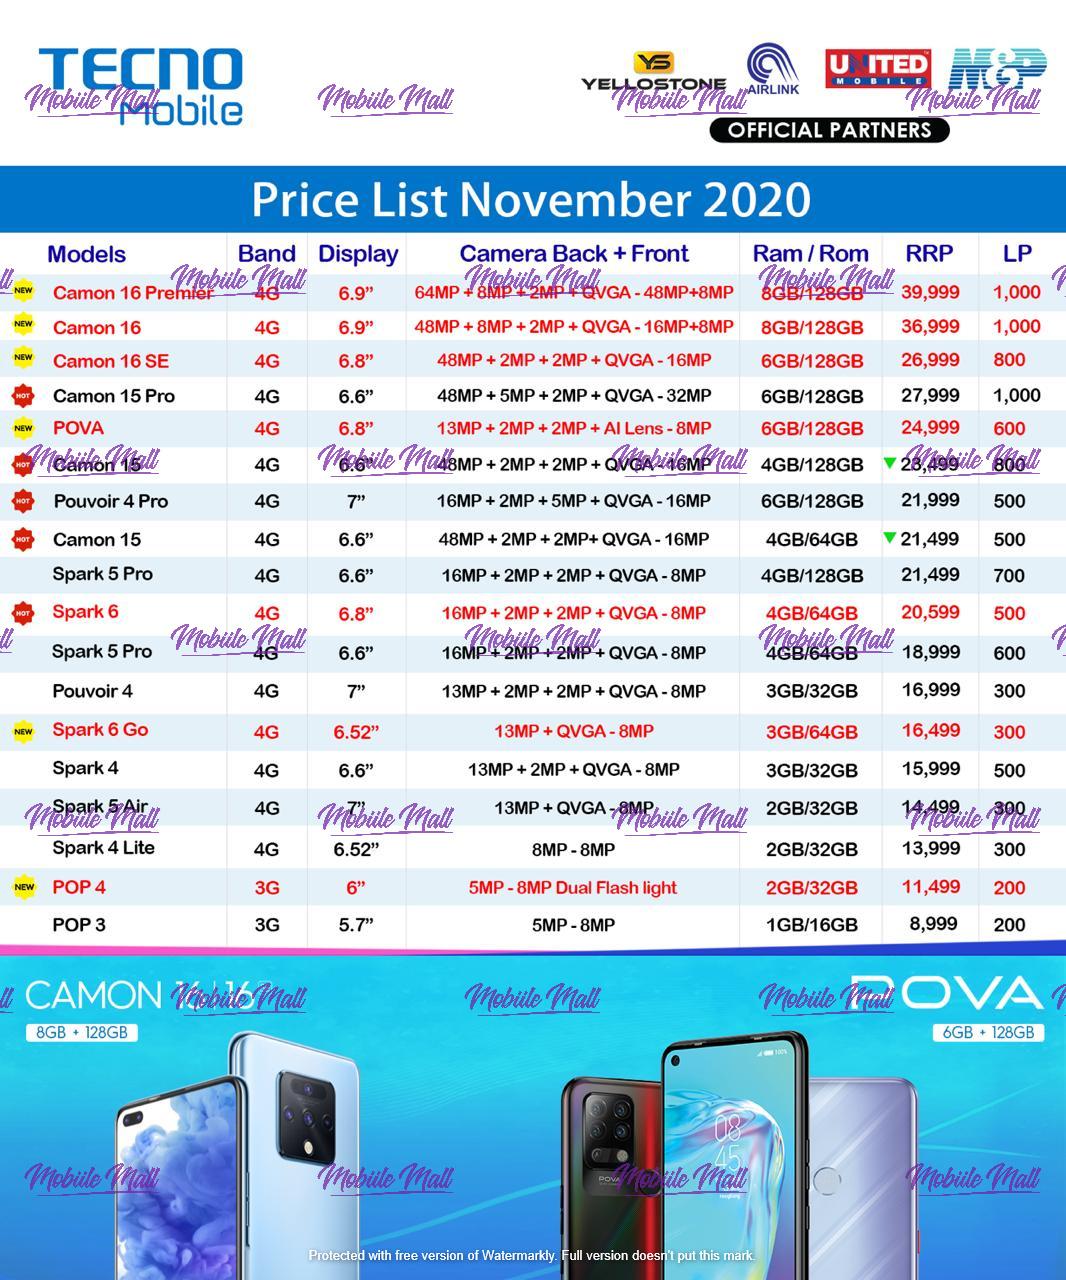 Tecno Dealer Price List - December 2020